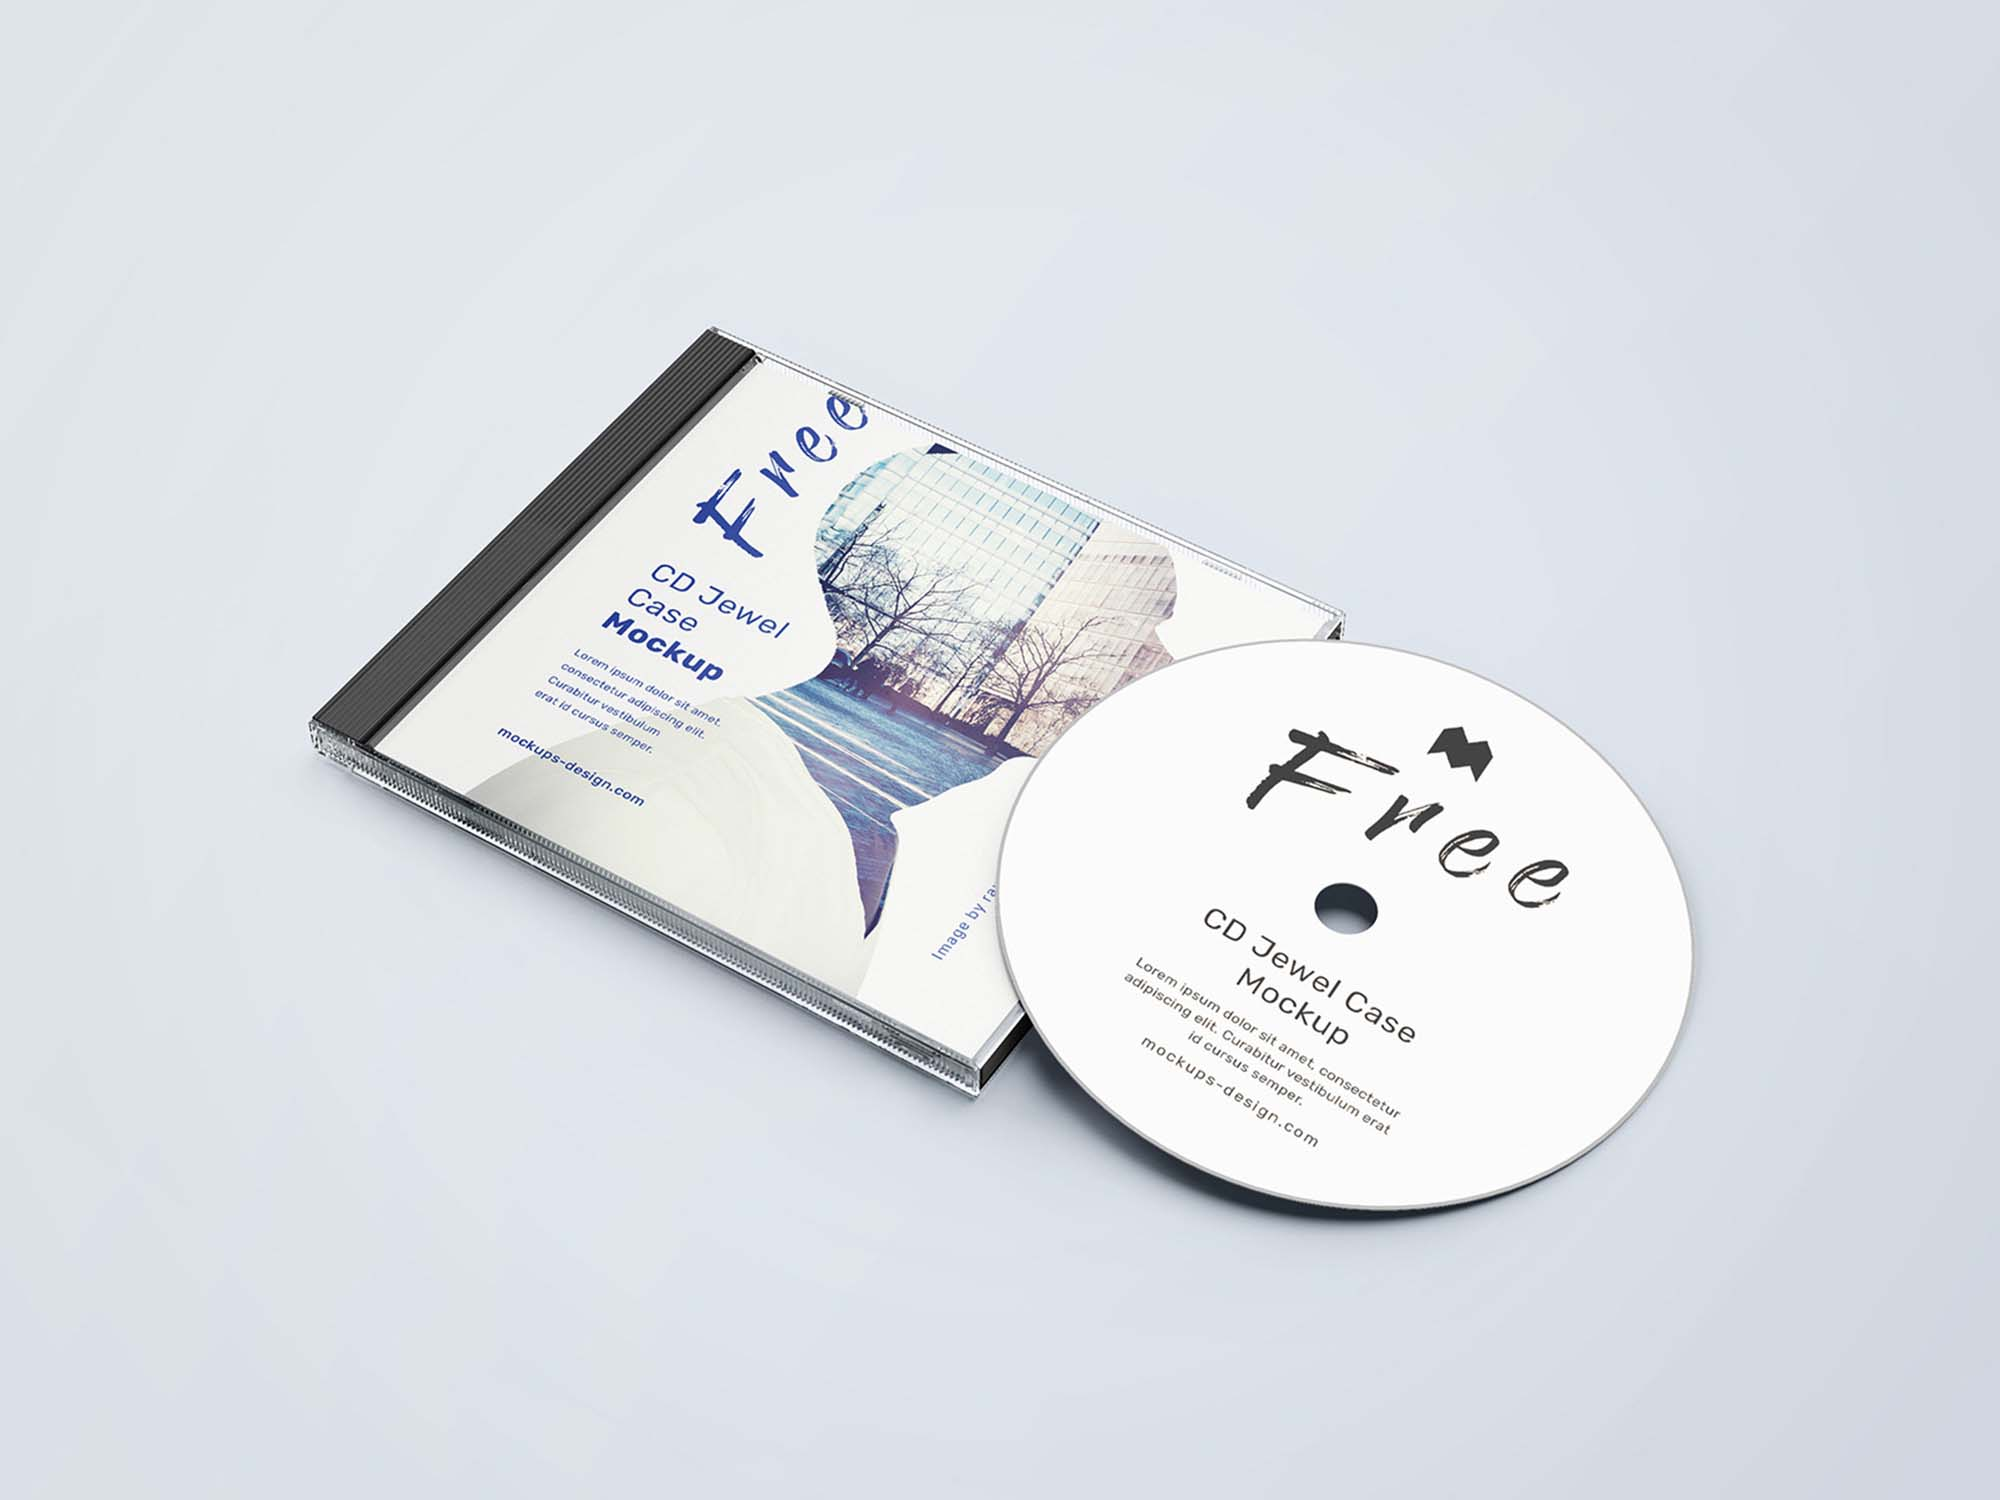 CD jewel Case Mockup 4